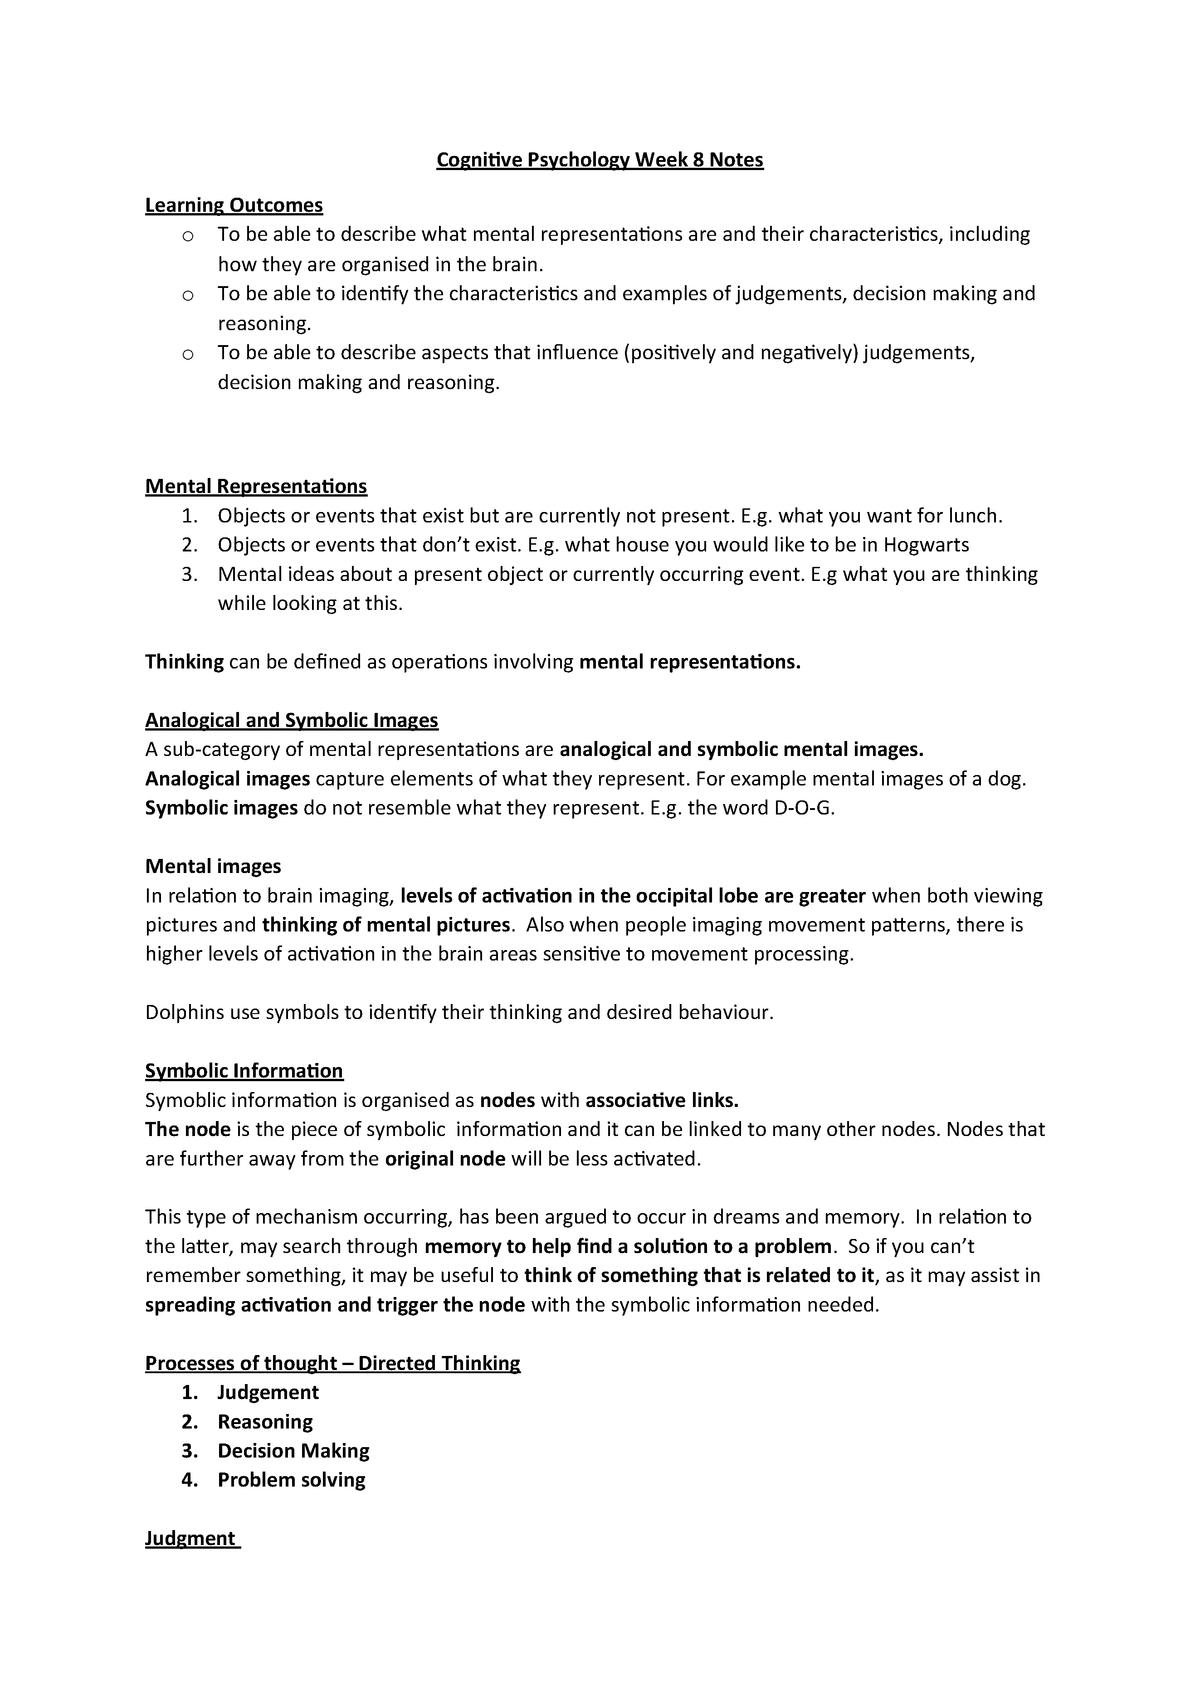 Cognitive Psychology Week 8 Notes - PS1009 - Abdn - StuDocu